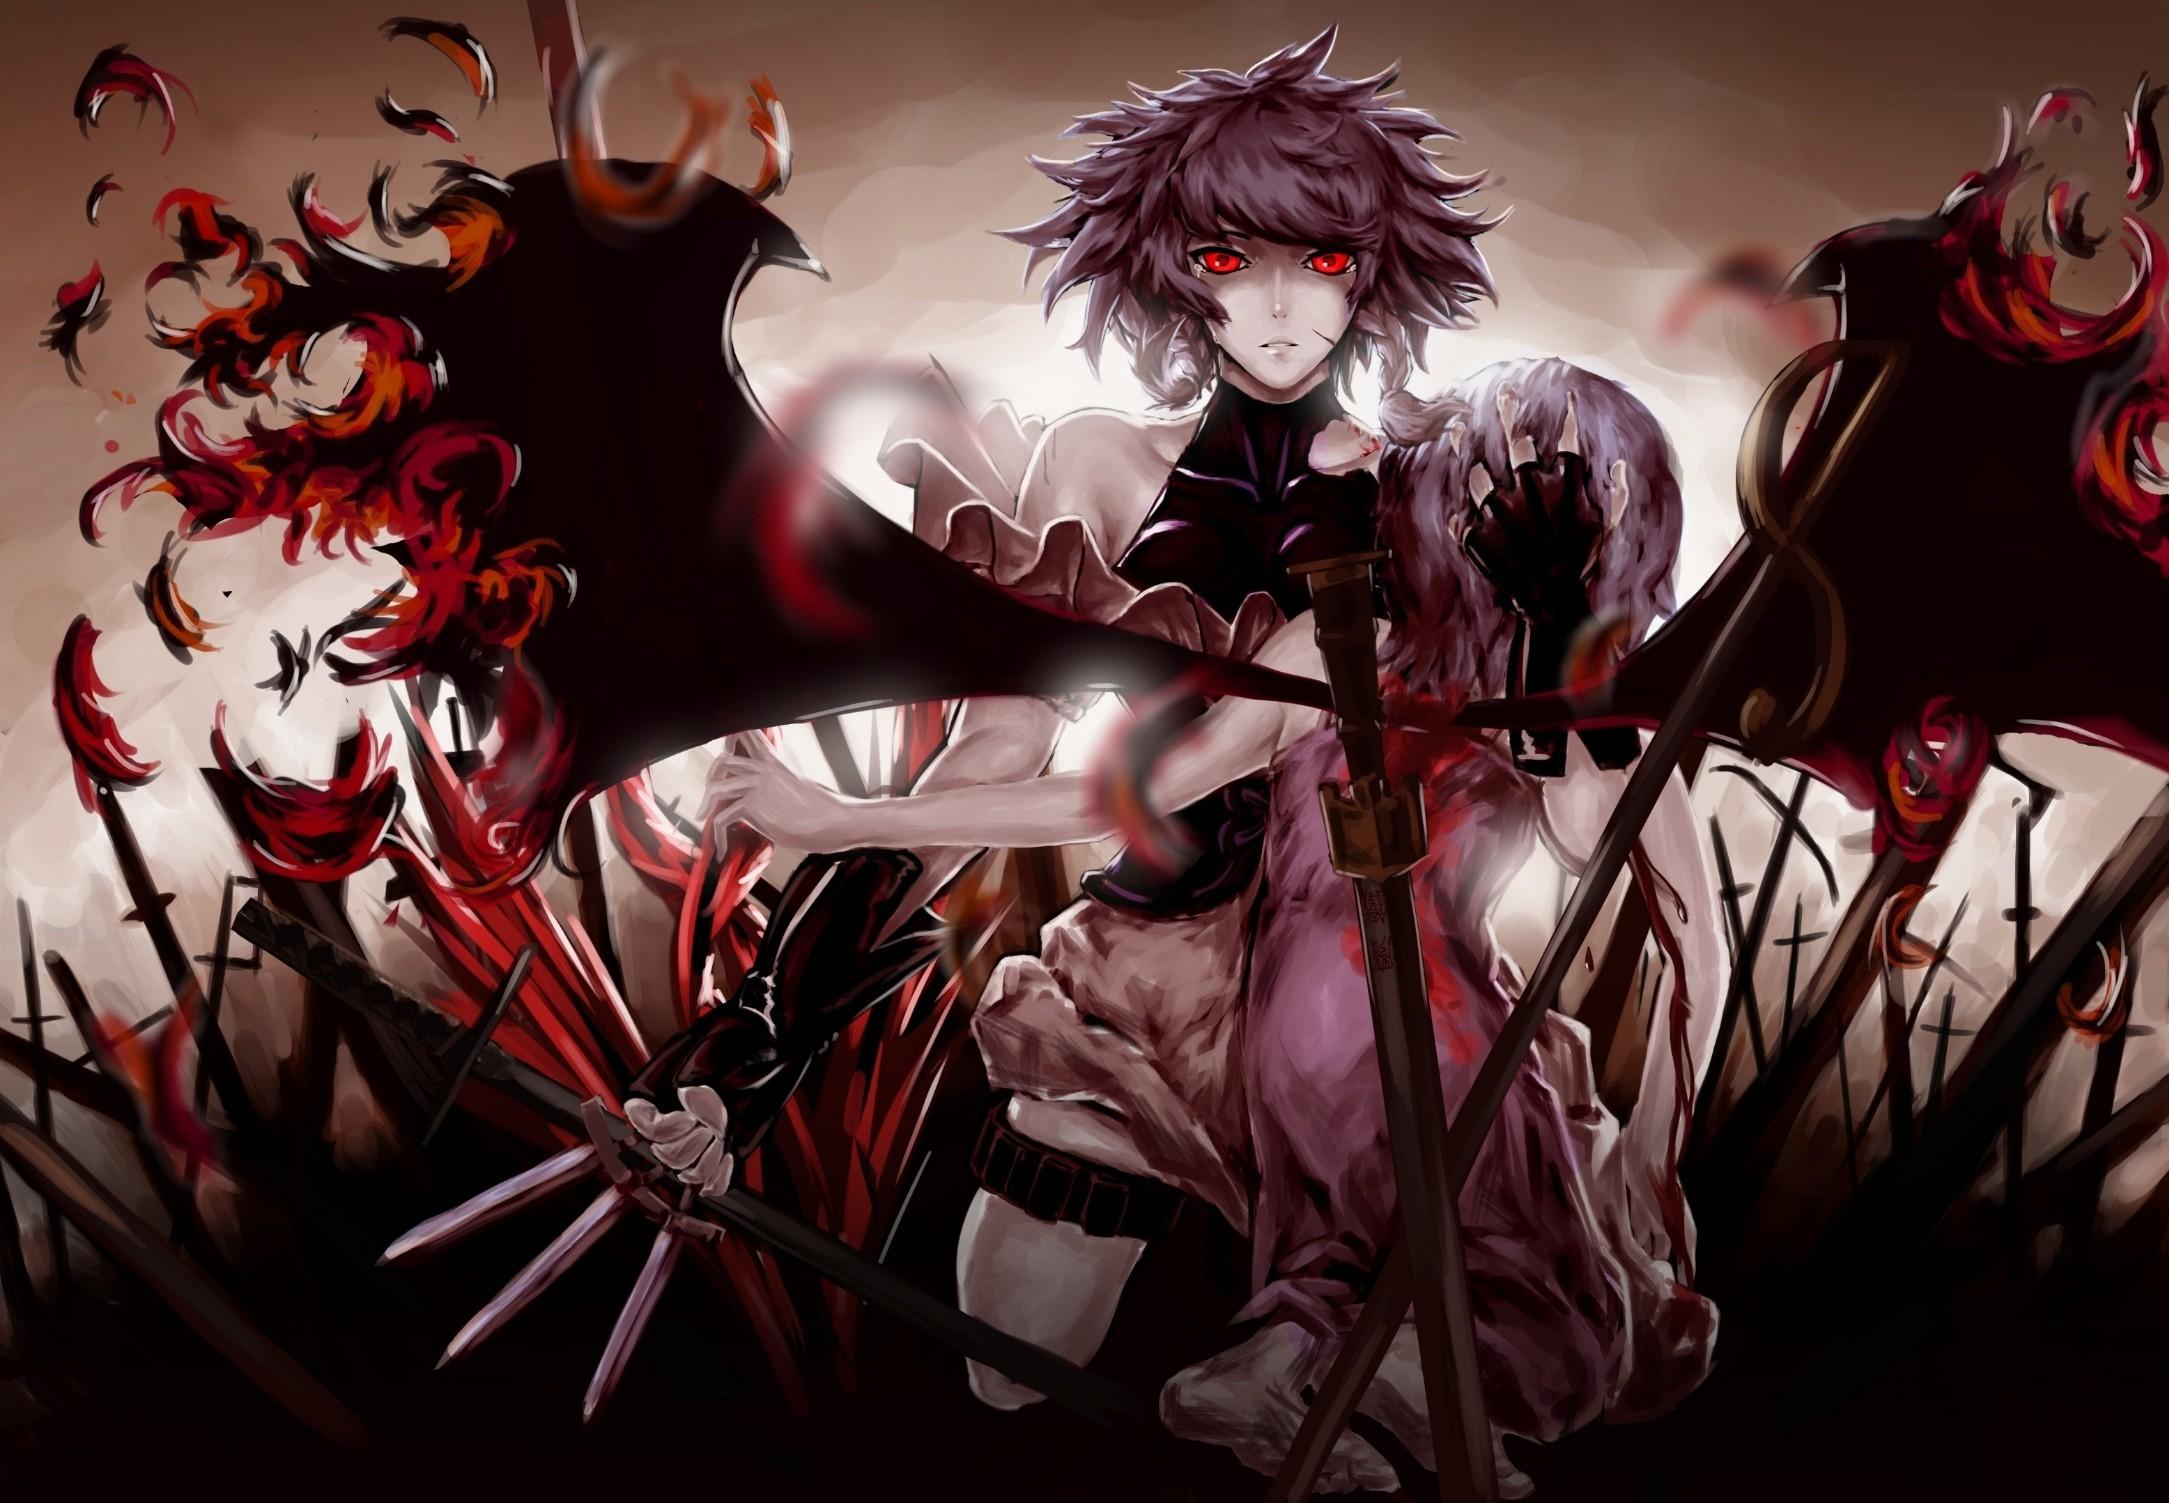 Res: 2169x1503, Red Anime Wallpaper - WallpaperSafari